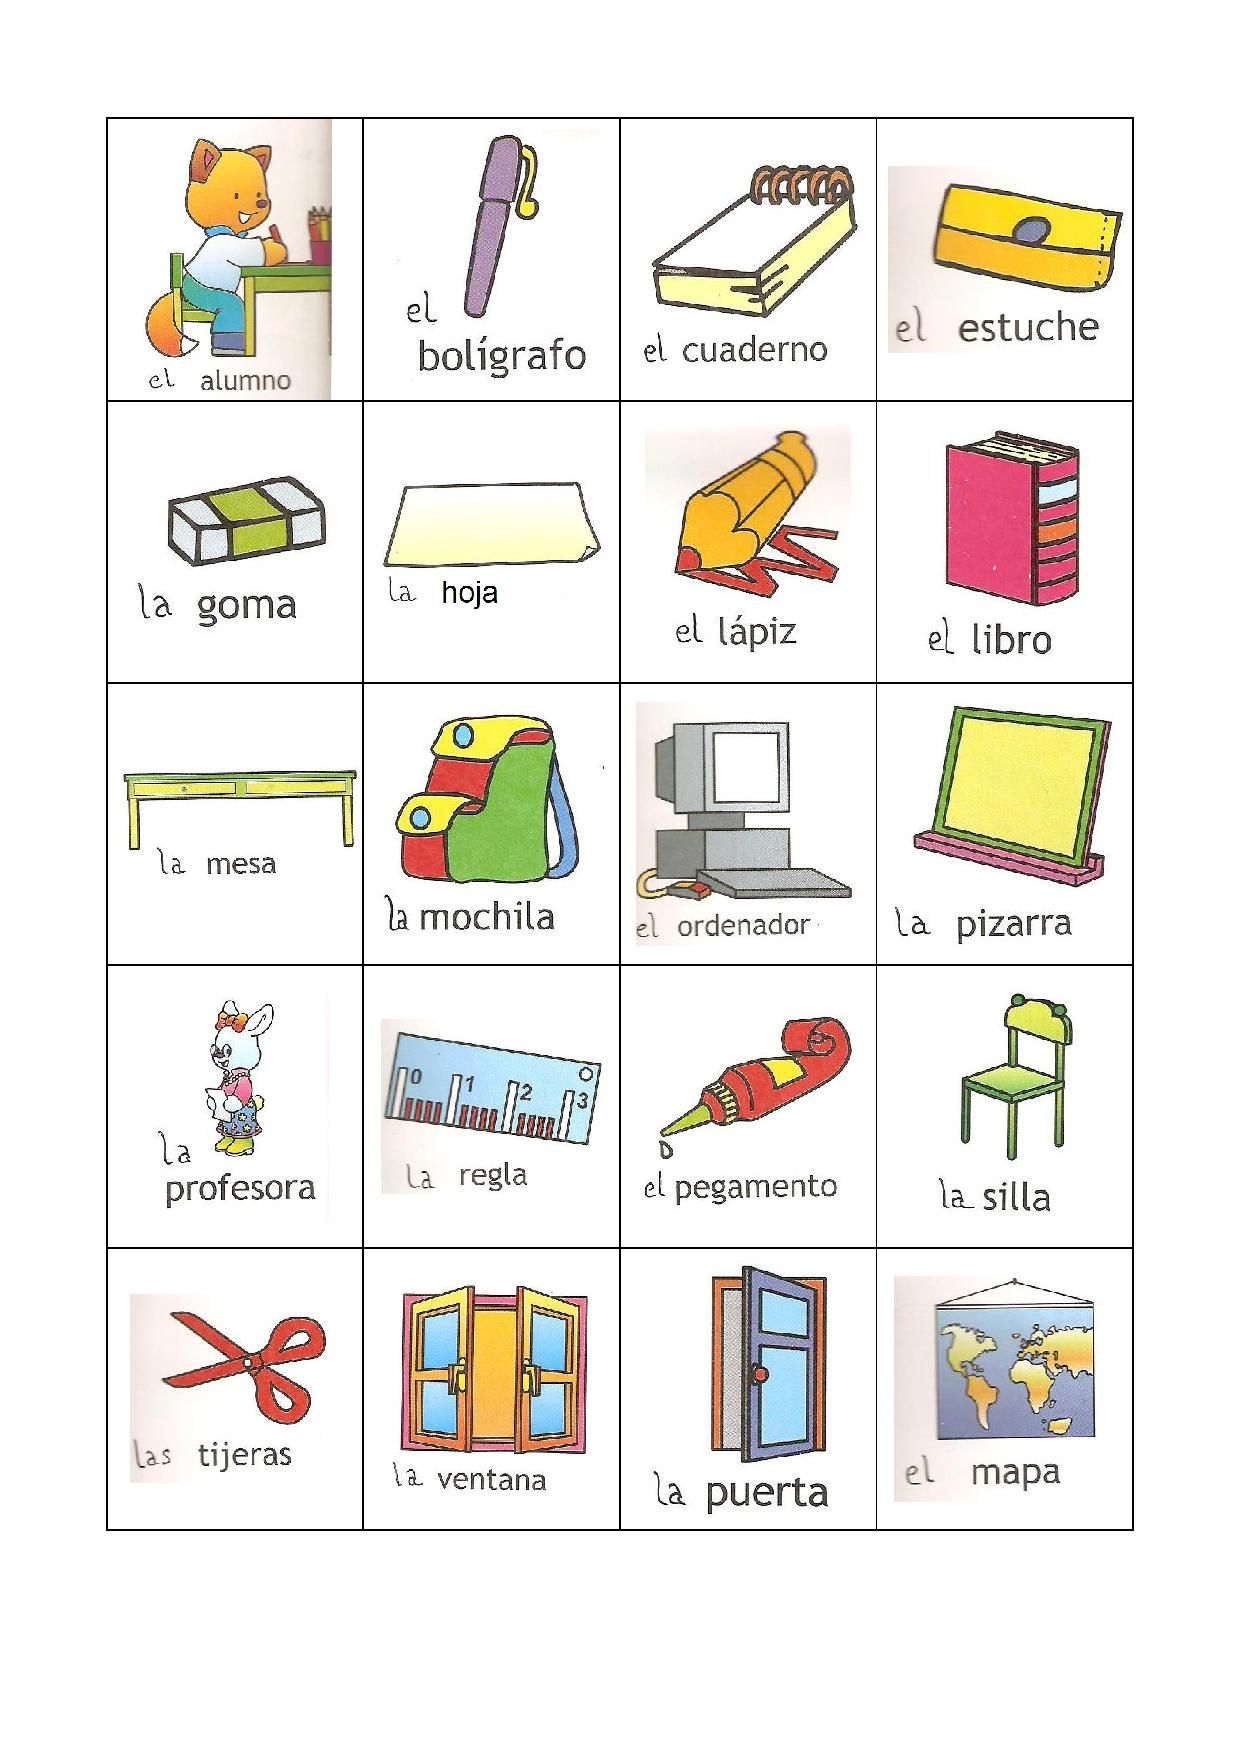 Pictionnary Objetos En El Aula De Clase Ficha Para